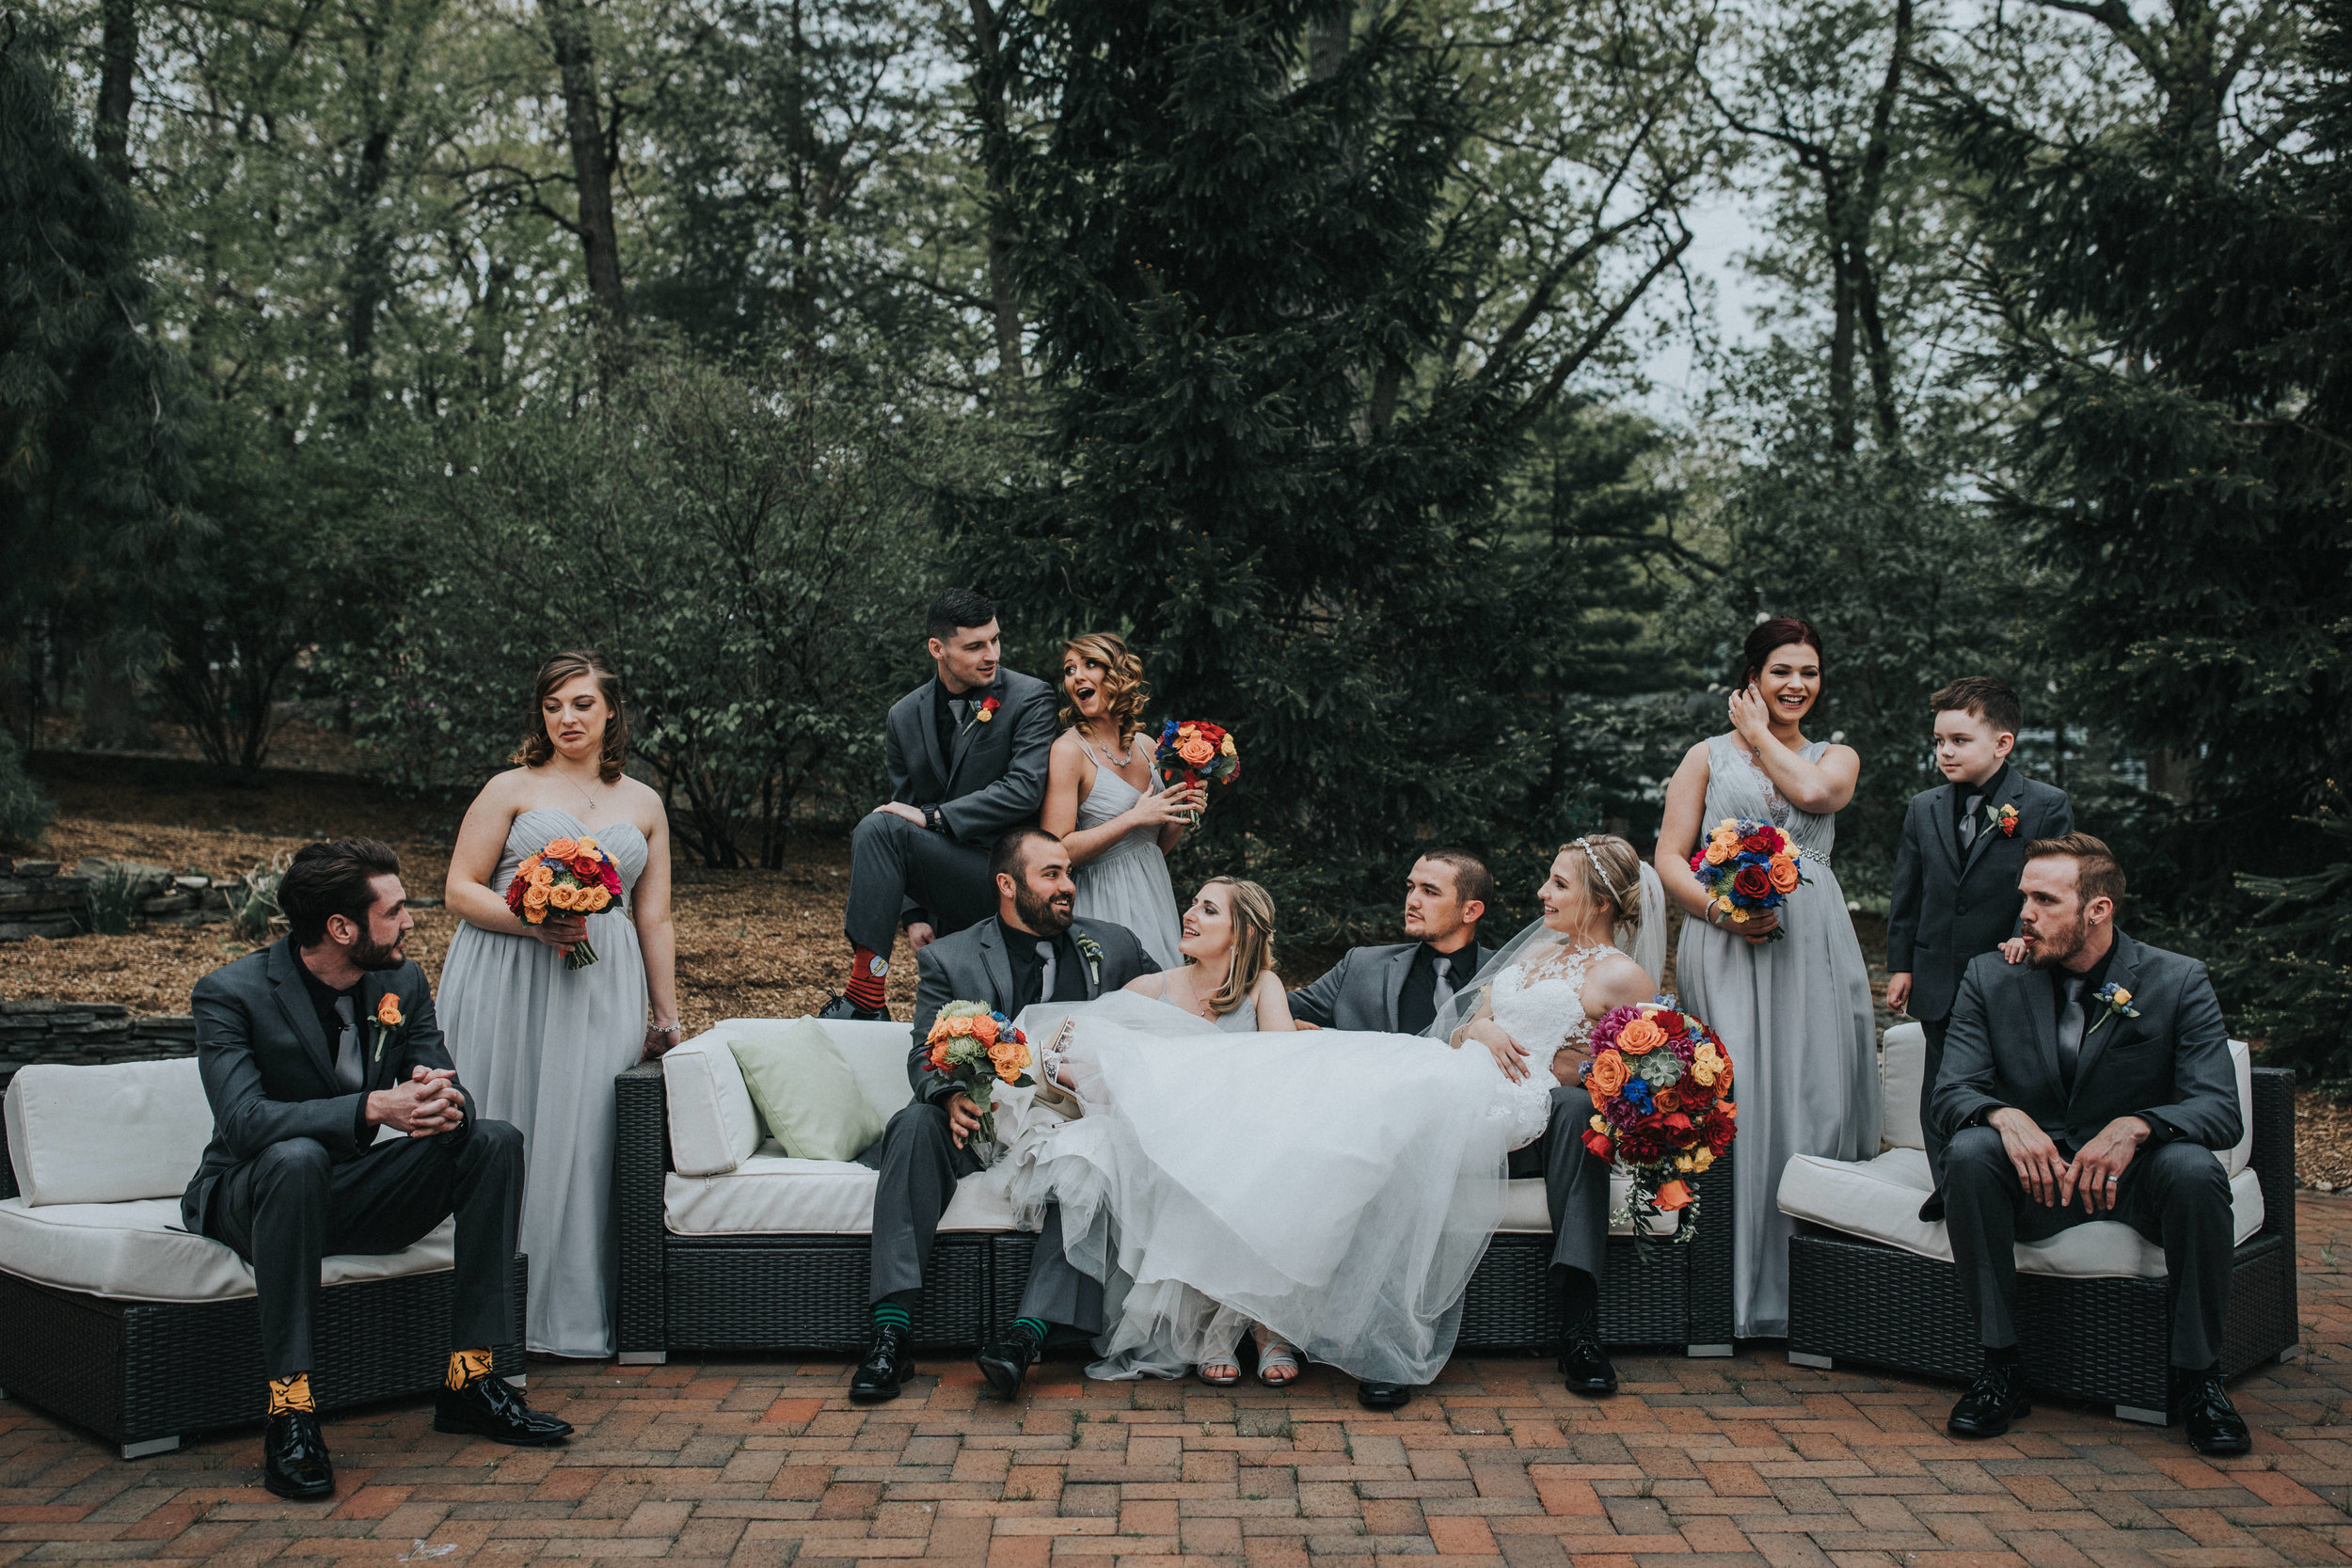 New-Jersey-Wedding-Photographer-Megan&Nick-BridalParty-9.jpg